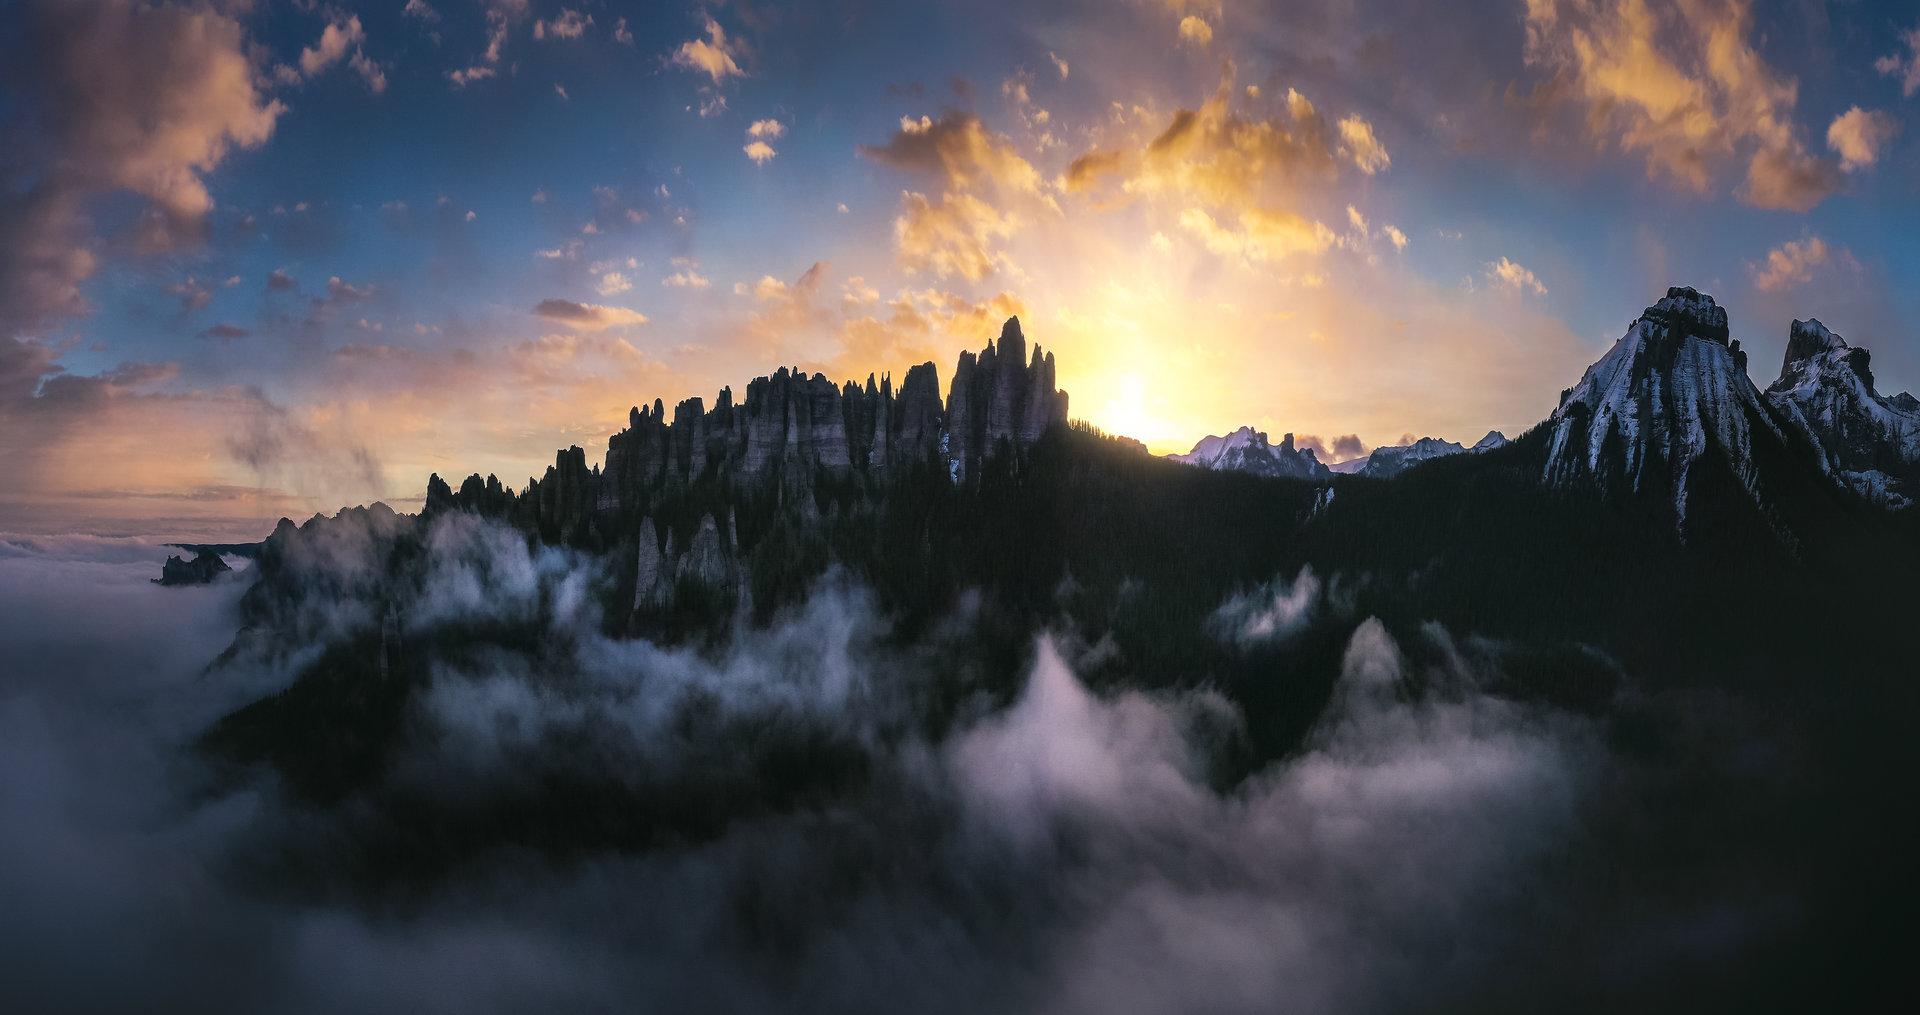 Колорадо | Author Remo Daut - wallburn | PHOTO FORUM